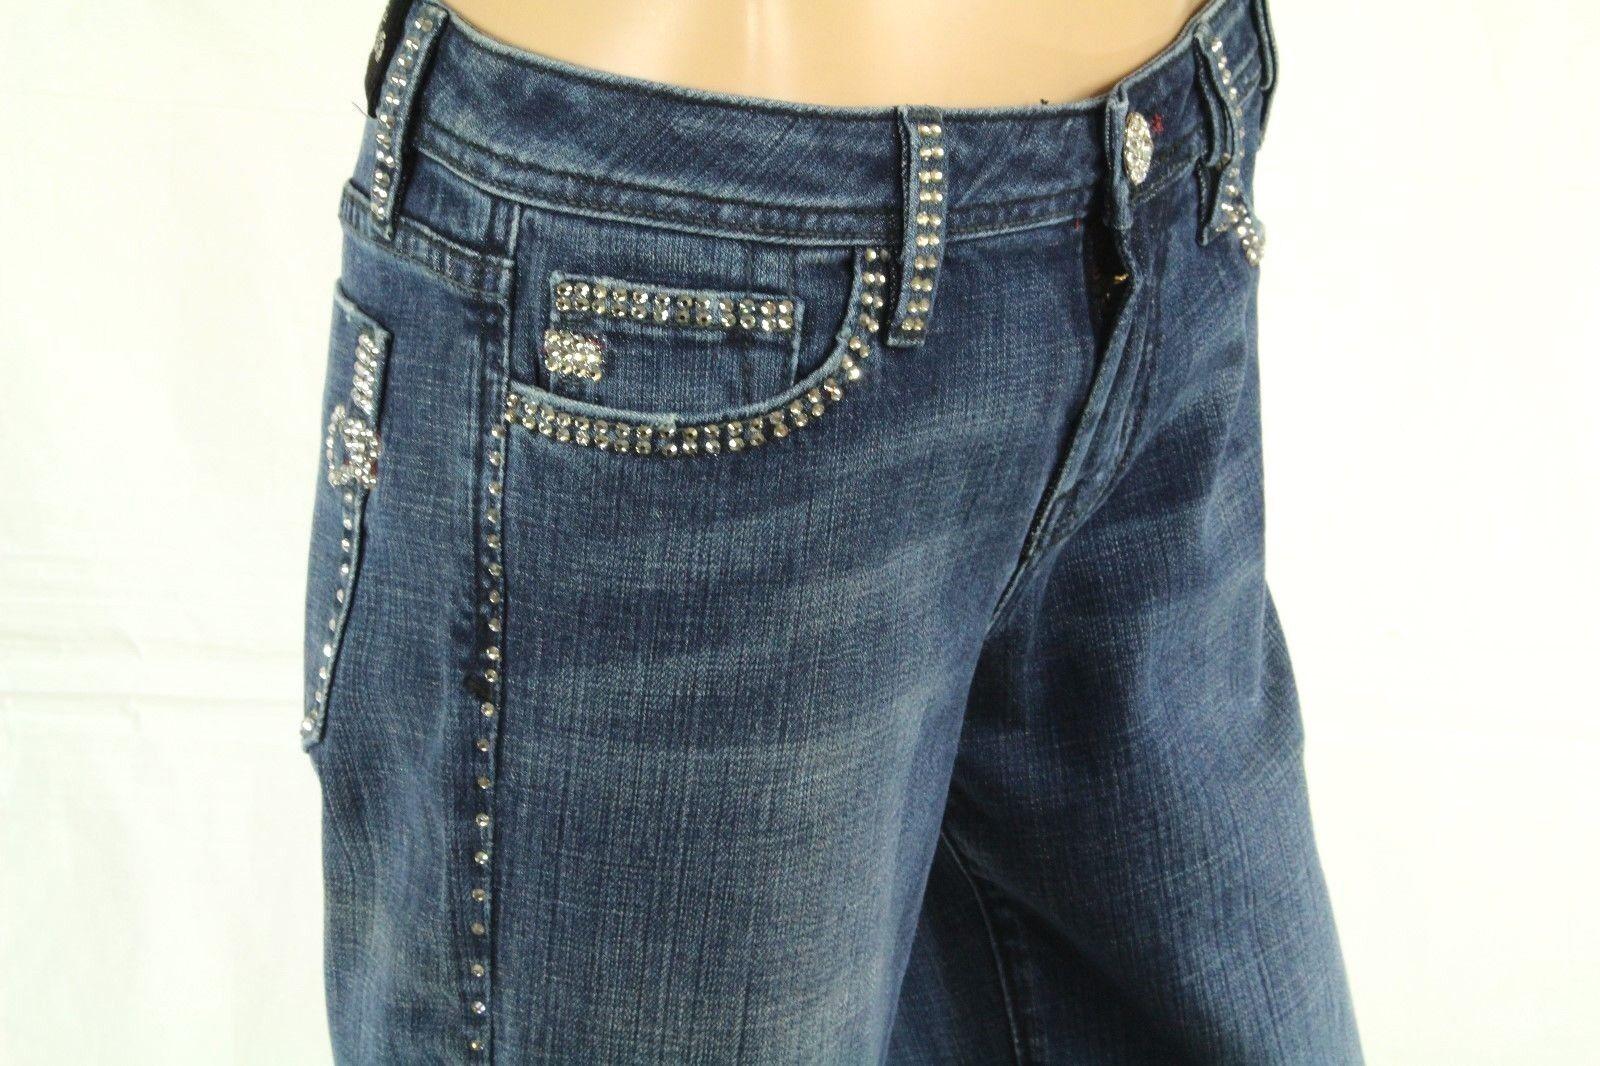 Claudio Milano Women's Jeans Swarovski Crystal Embellished Size 28  260